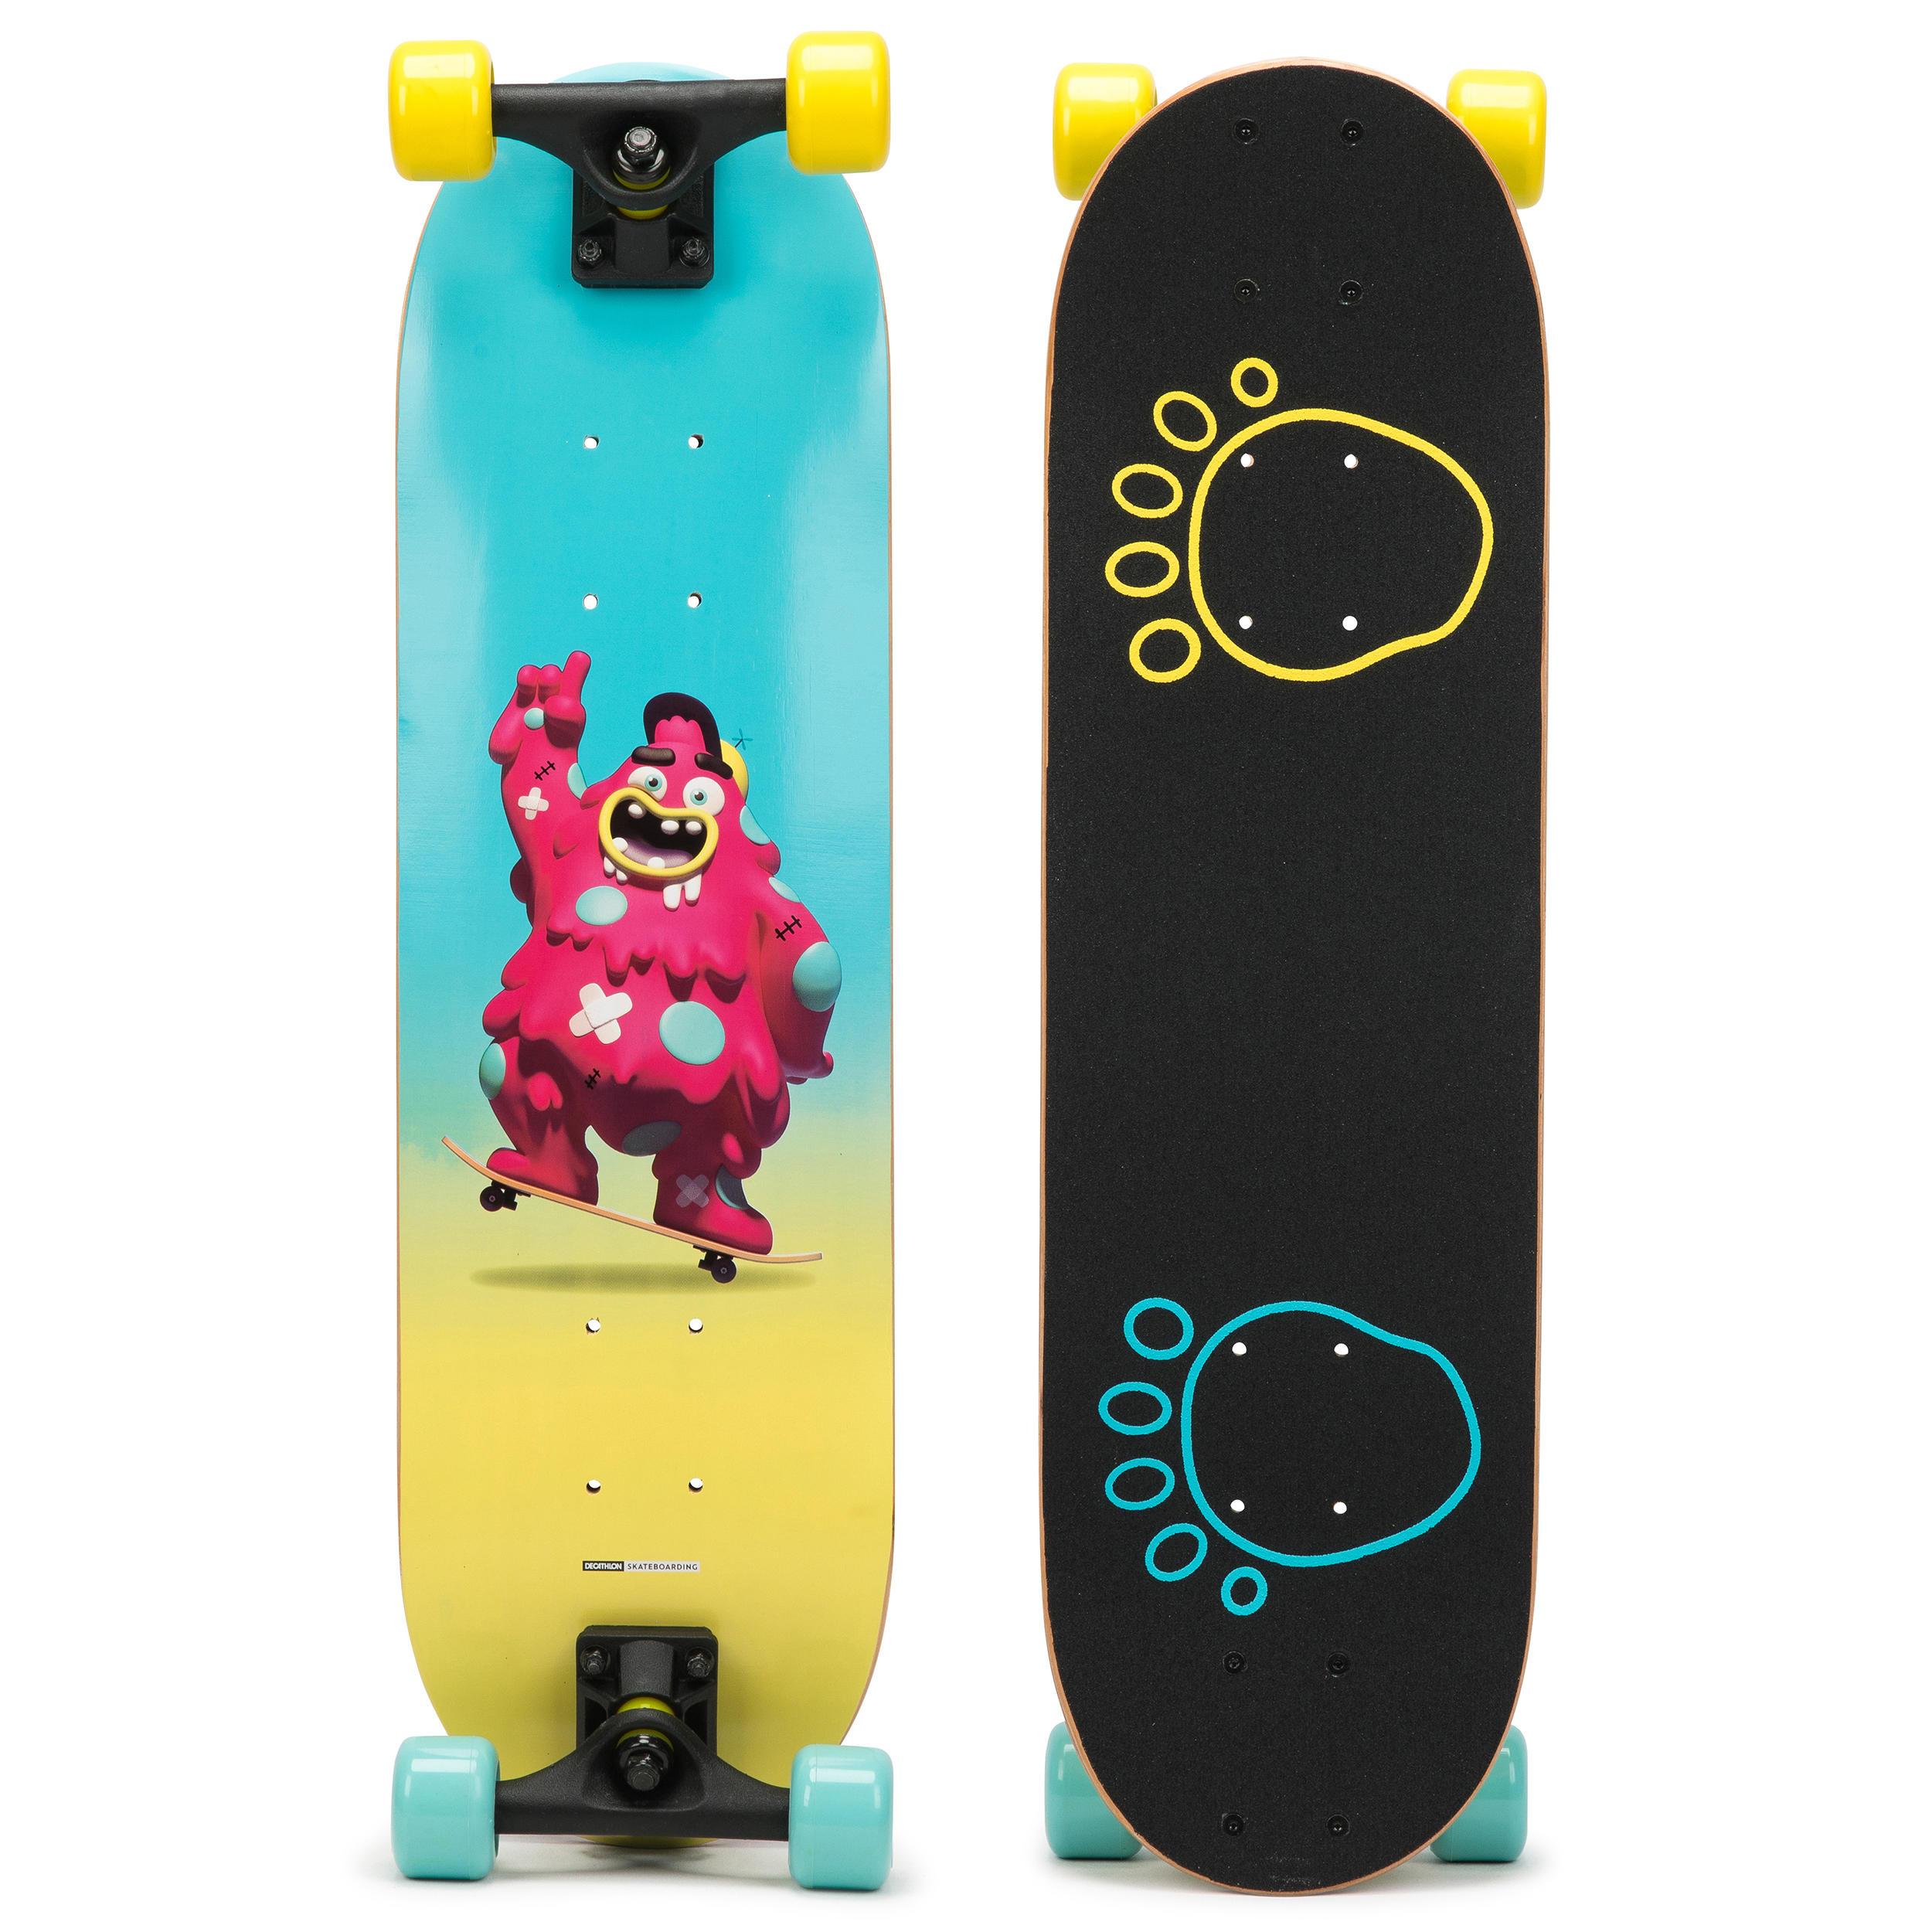 Skateboard PLAY 120 Copii imagine